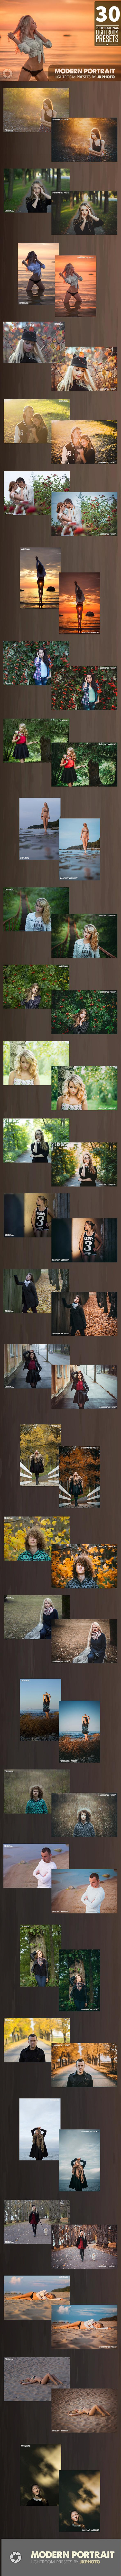 GraphicRiver 30 Portrait Lightroom Presets 11213141